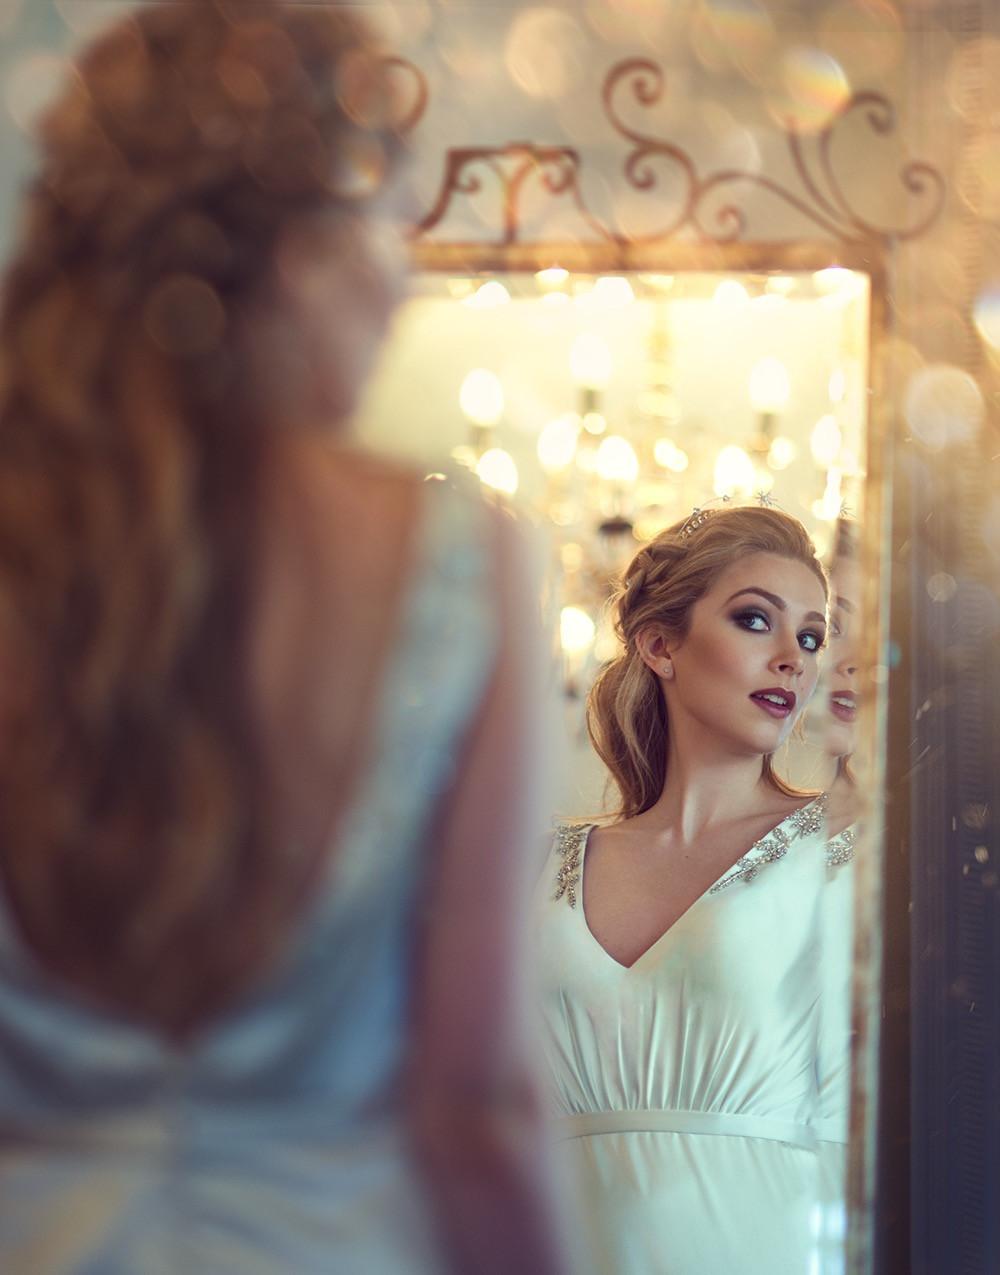 Venue: Warbrook house  Dress: Tillymint weddings Accessories: Wilde Bride Hair & Makeup: me - Make Me Bridal Artist: Melissa Clare Makeup & Hair. Photography by: Natalia D'ark. #glamorous #halfuphair #contoured